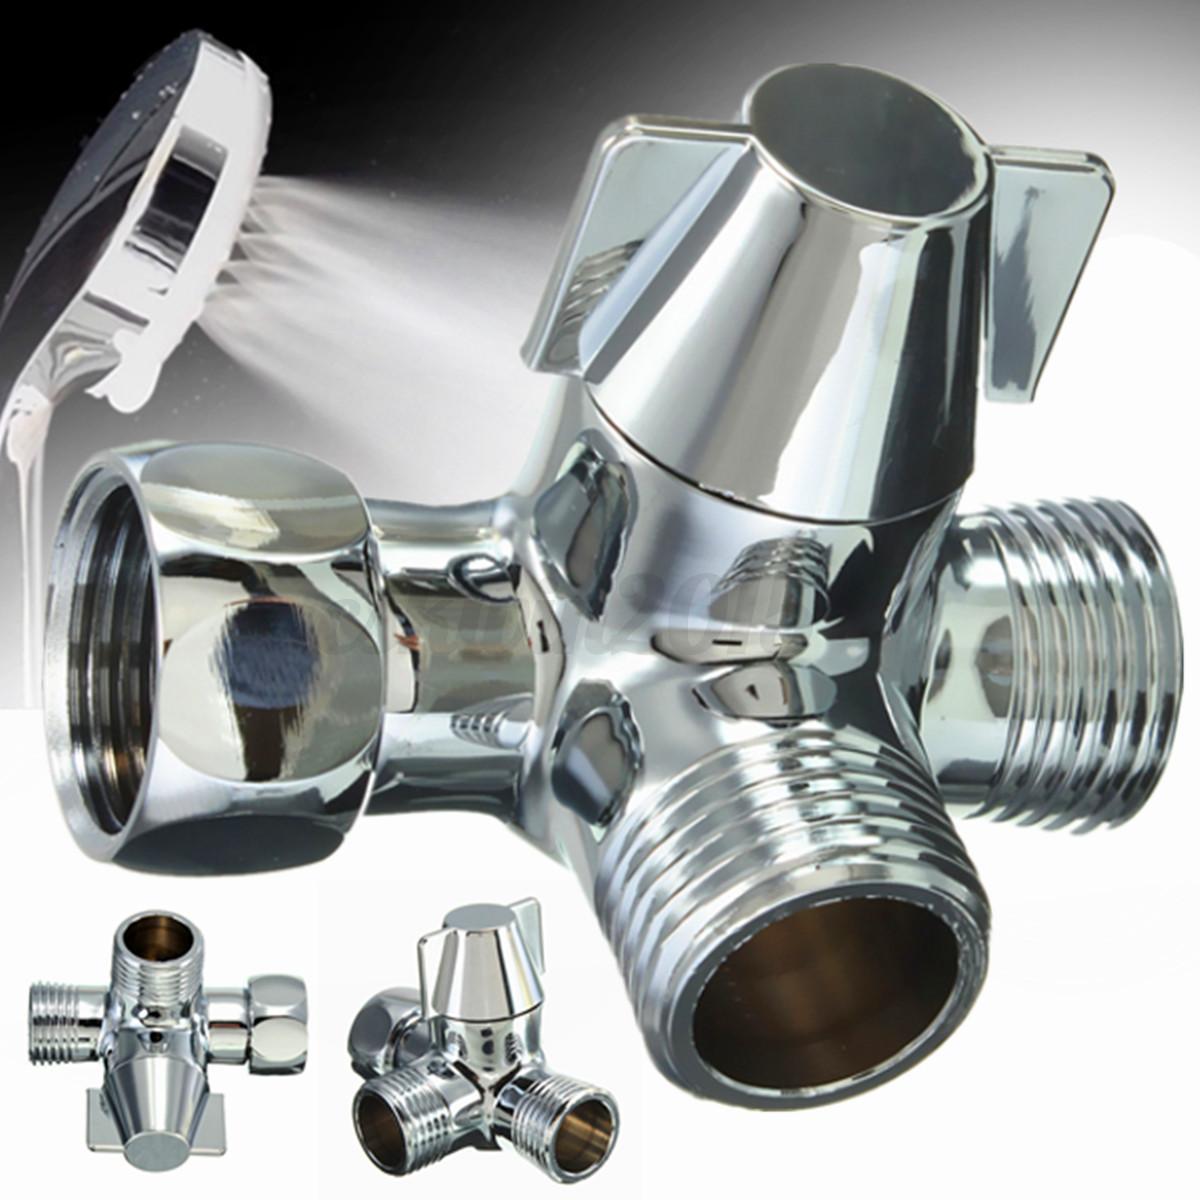 Details About G1 2 Brass Chrome 3 Way T Adapter Shower Head Diverter Valve Shower Head Combo